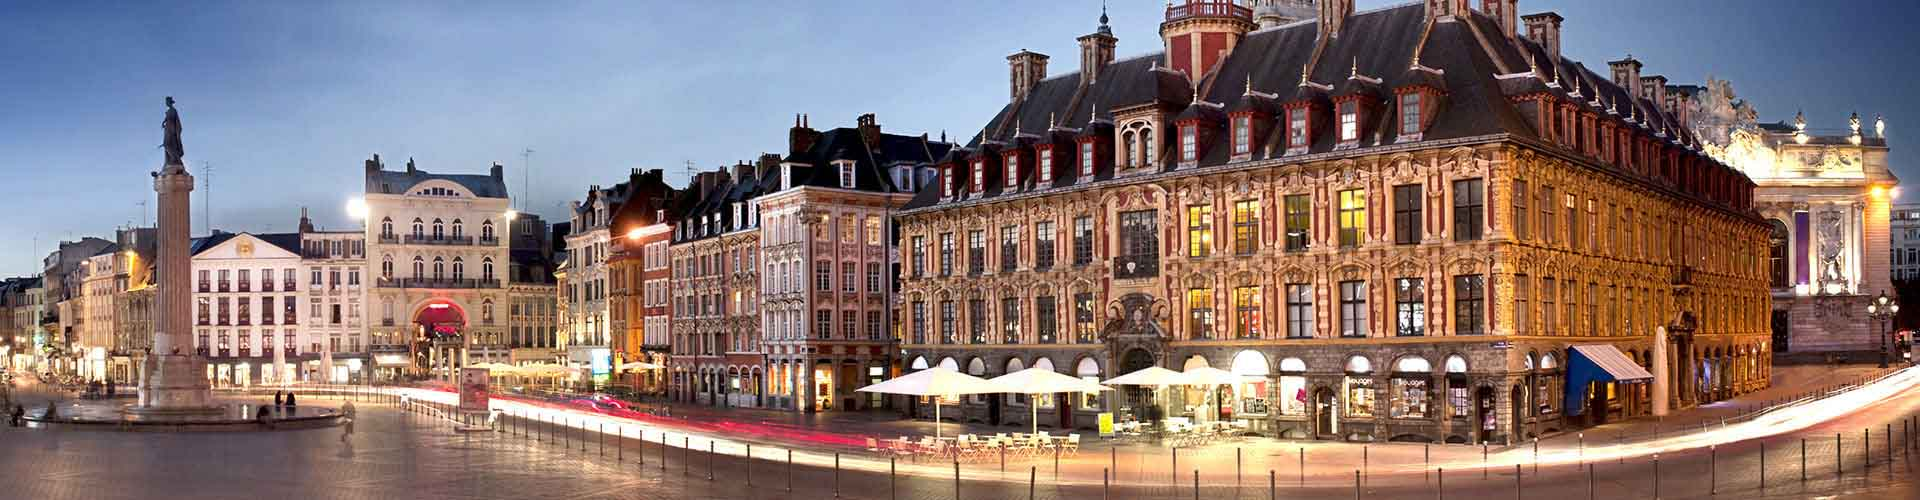 Lille - Hoteles baratos en Lille. Mapas de Lille, Fotos y comentarios de cada Hotel en Lille.